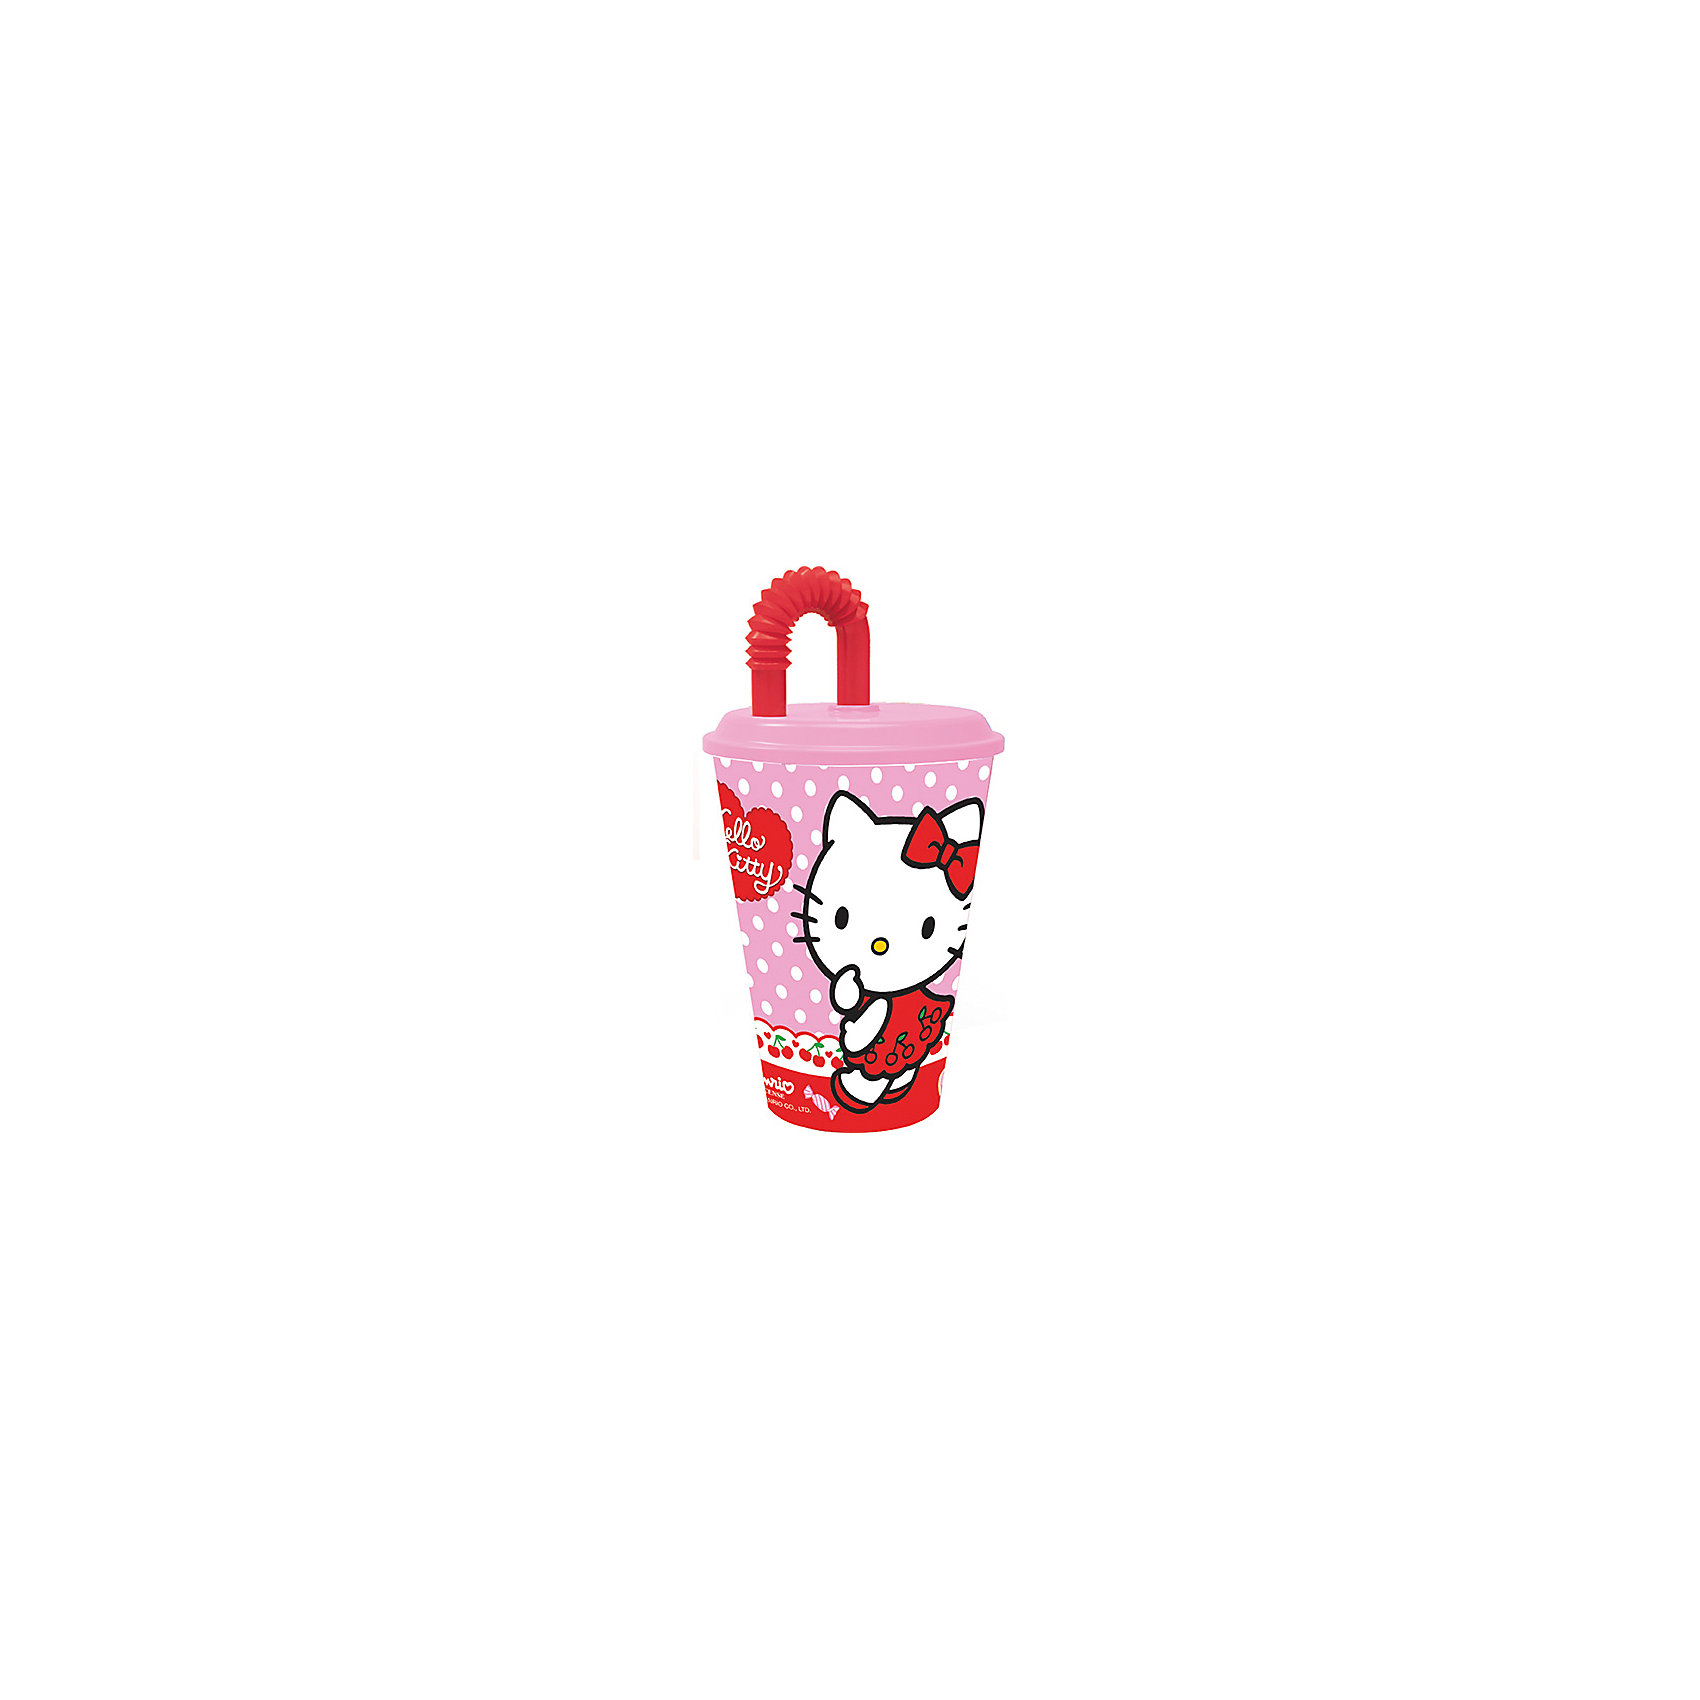 МФК-профит Бокал Hello Kitty 450 мл с крышкой и трубочкой бокал monte carlo  объем 600 мл  высота